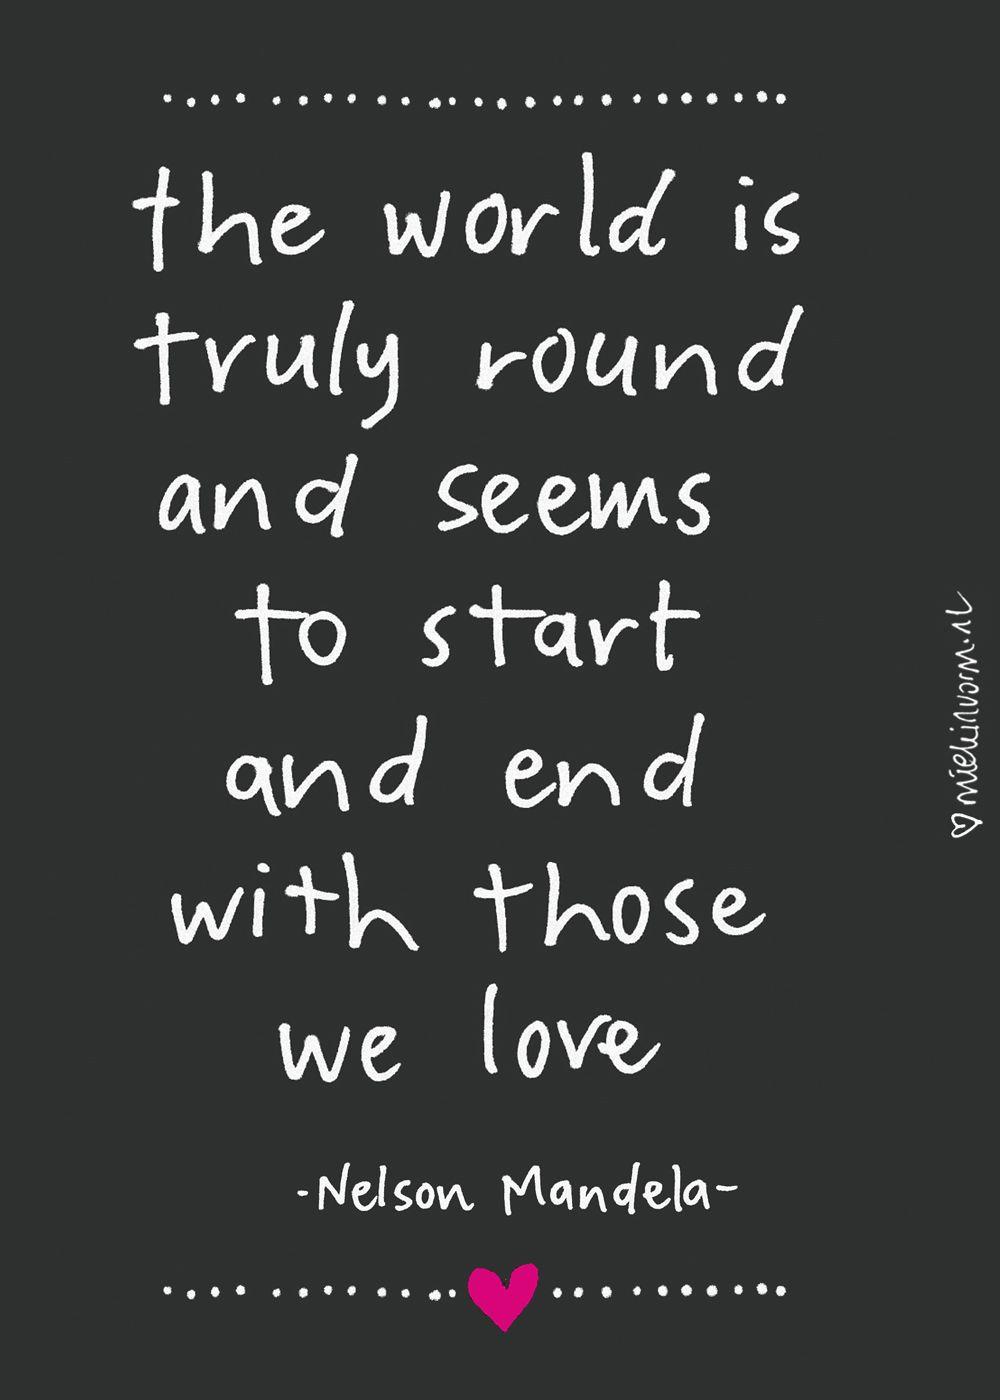 Mandela Quotes About Love Remembering Nelson Mandela ♥ Day340  6 December  365Daysa